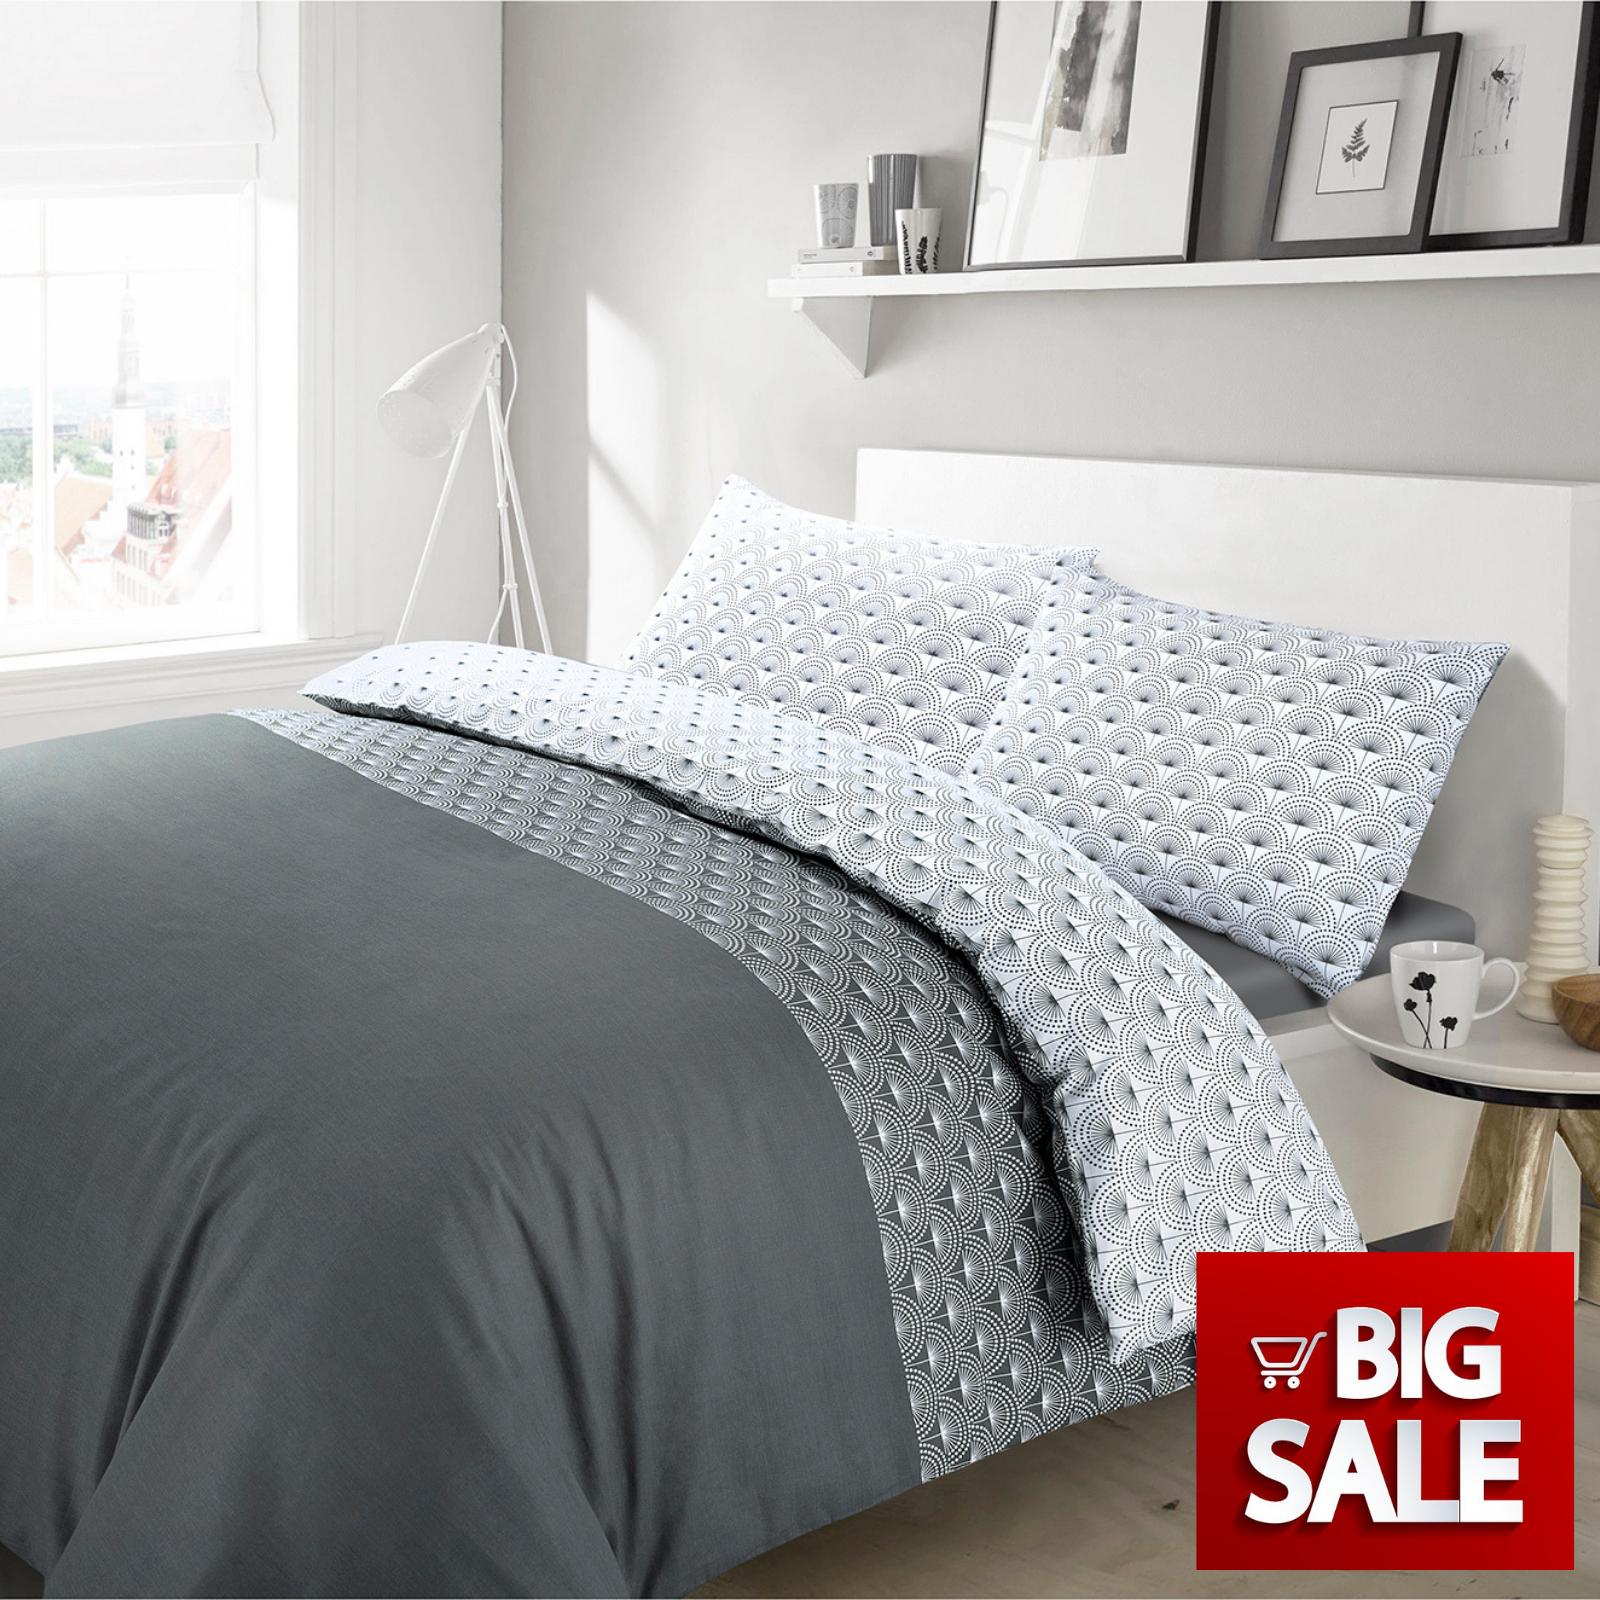 Floral Paloma Duvet Quilt Covers Bedding Sets Single Double Super King Size Grey Ebay